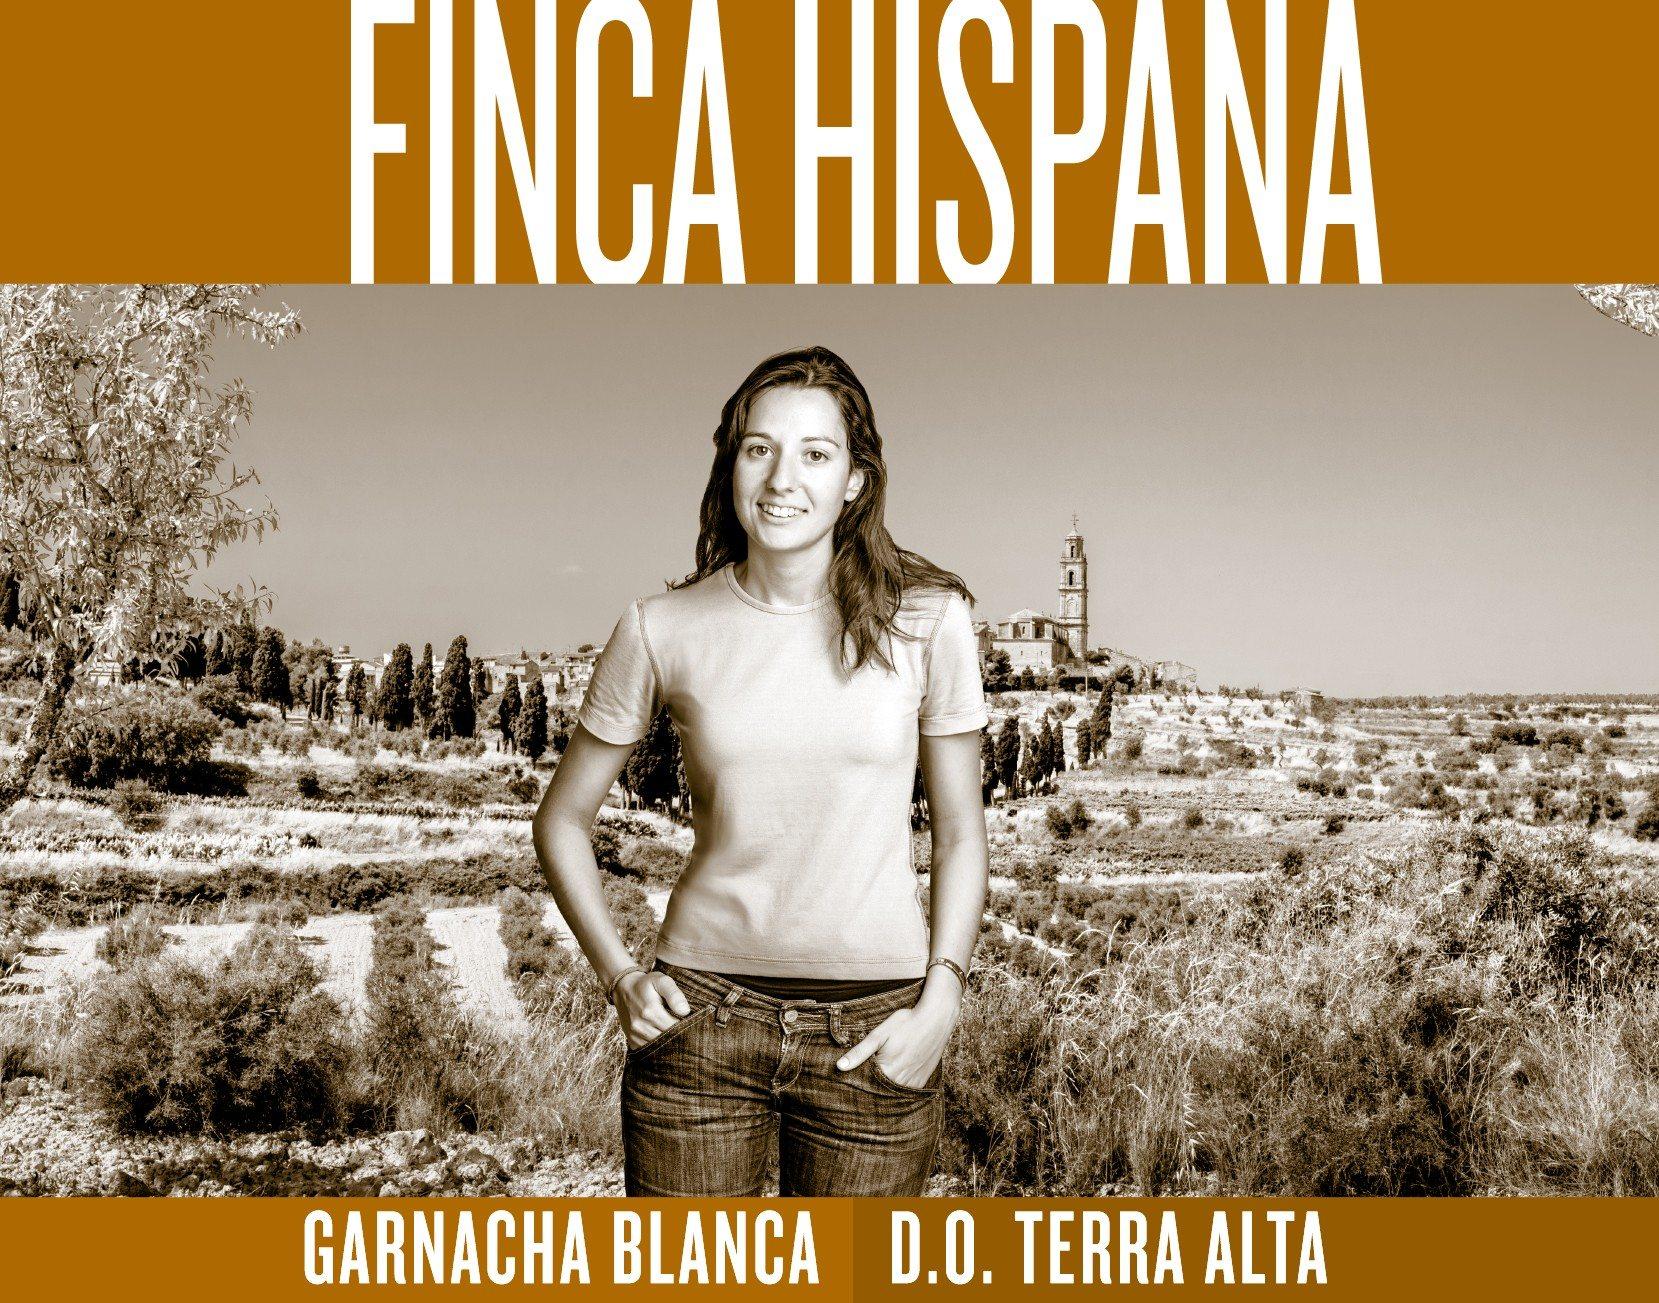 Finca-Hispana-Garnacha-Blanca.jpg